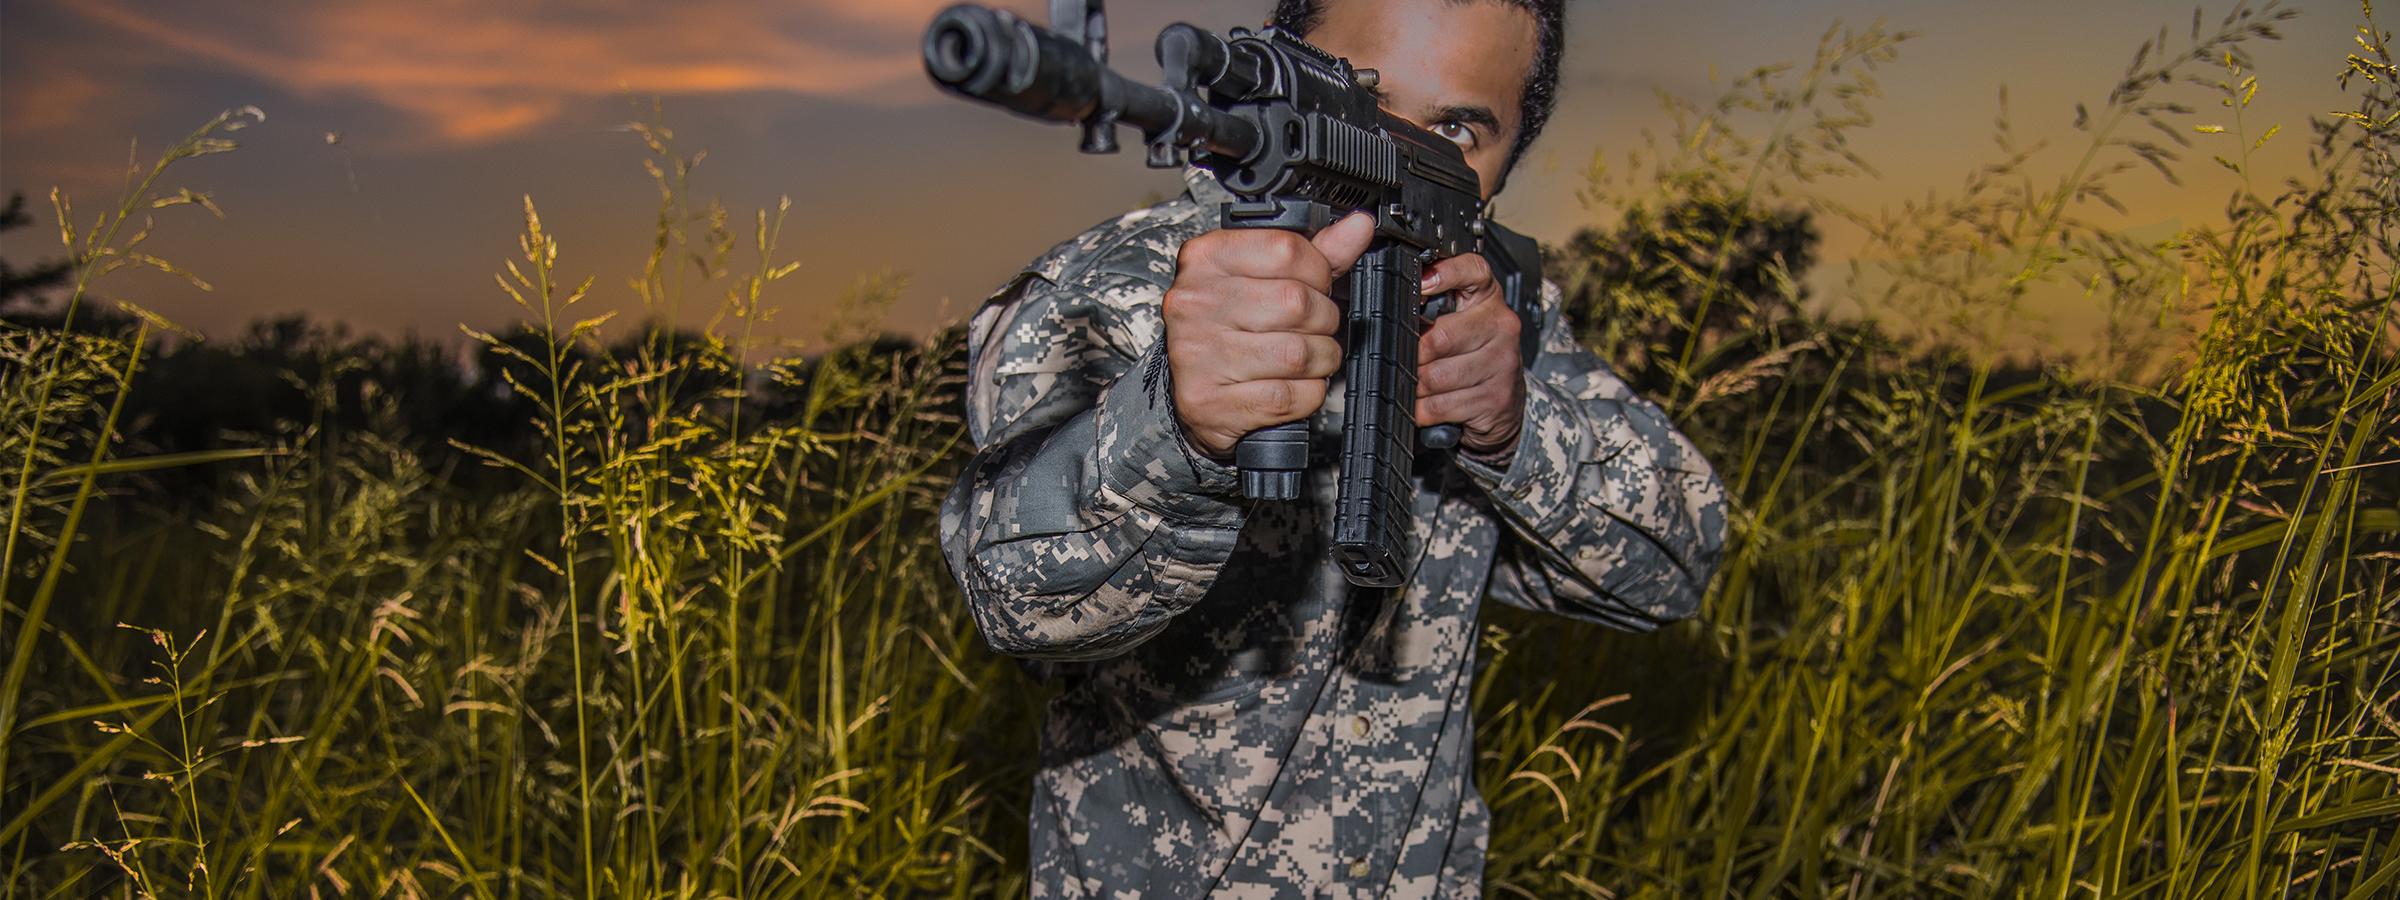 Men's Hunting Shirts, Tiger Hill Hunting Shirts. Camo Hunting Shirt